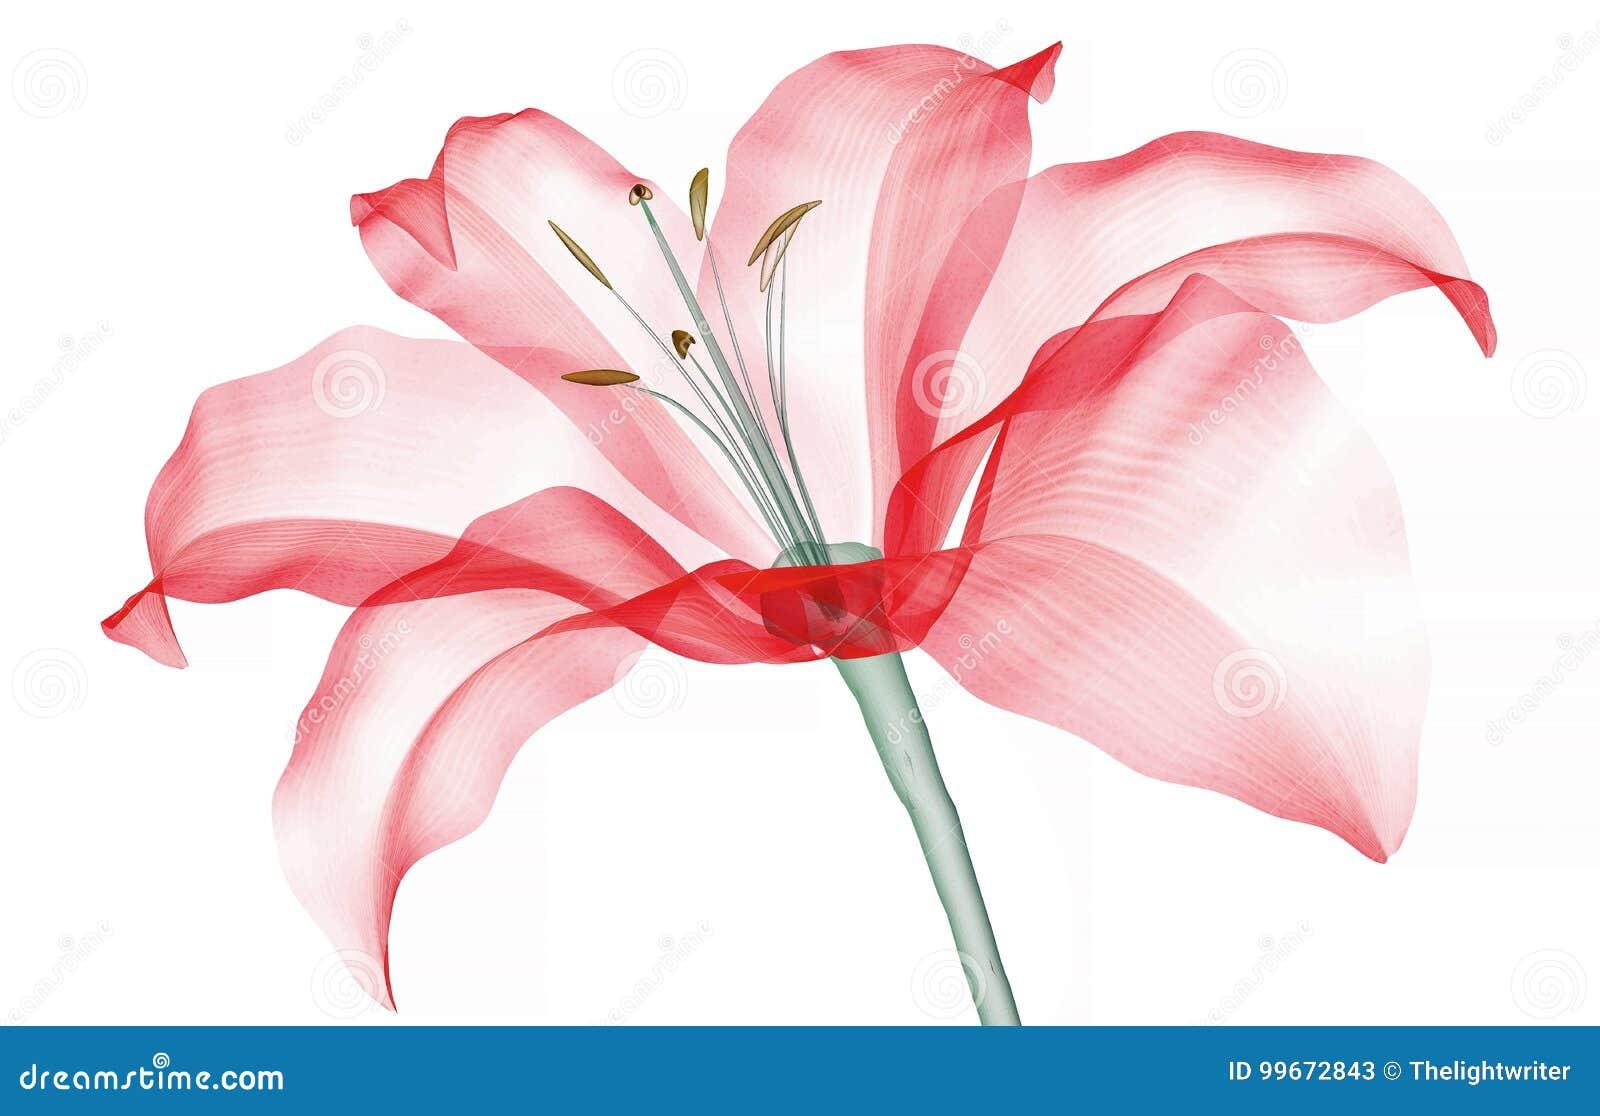 X射线辐射在白色隔绝的花,百合的图象